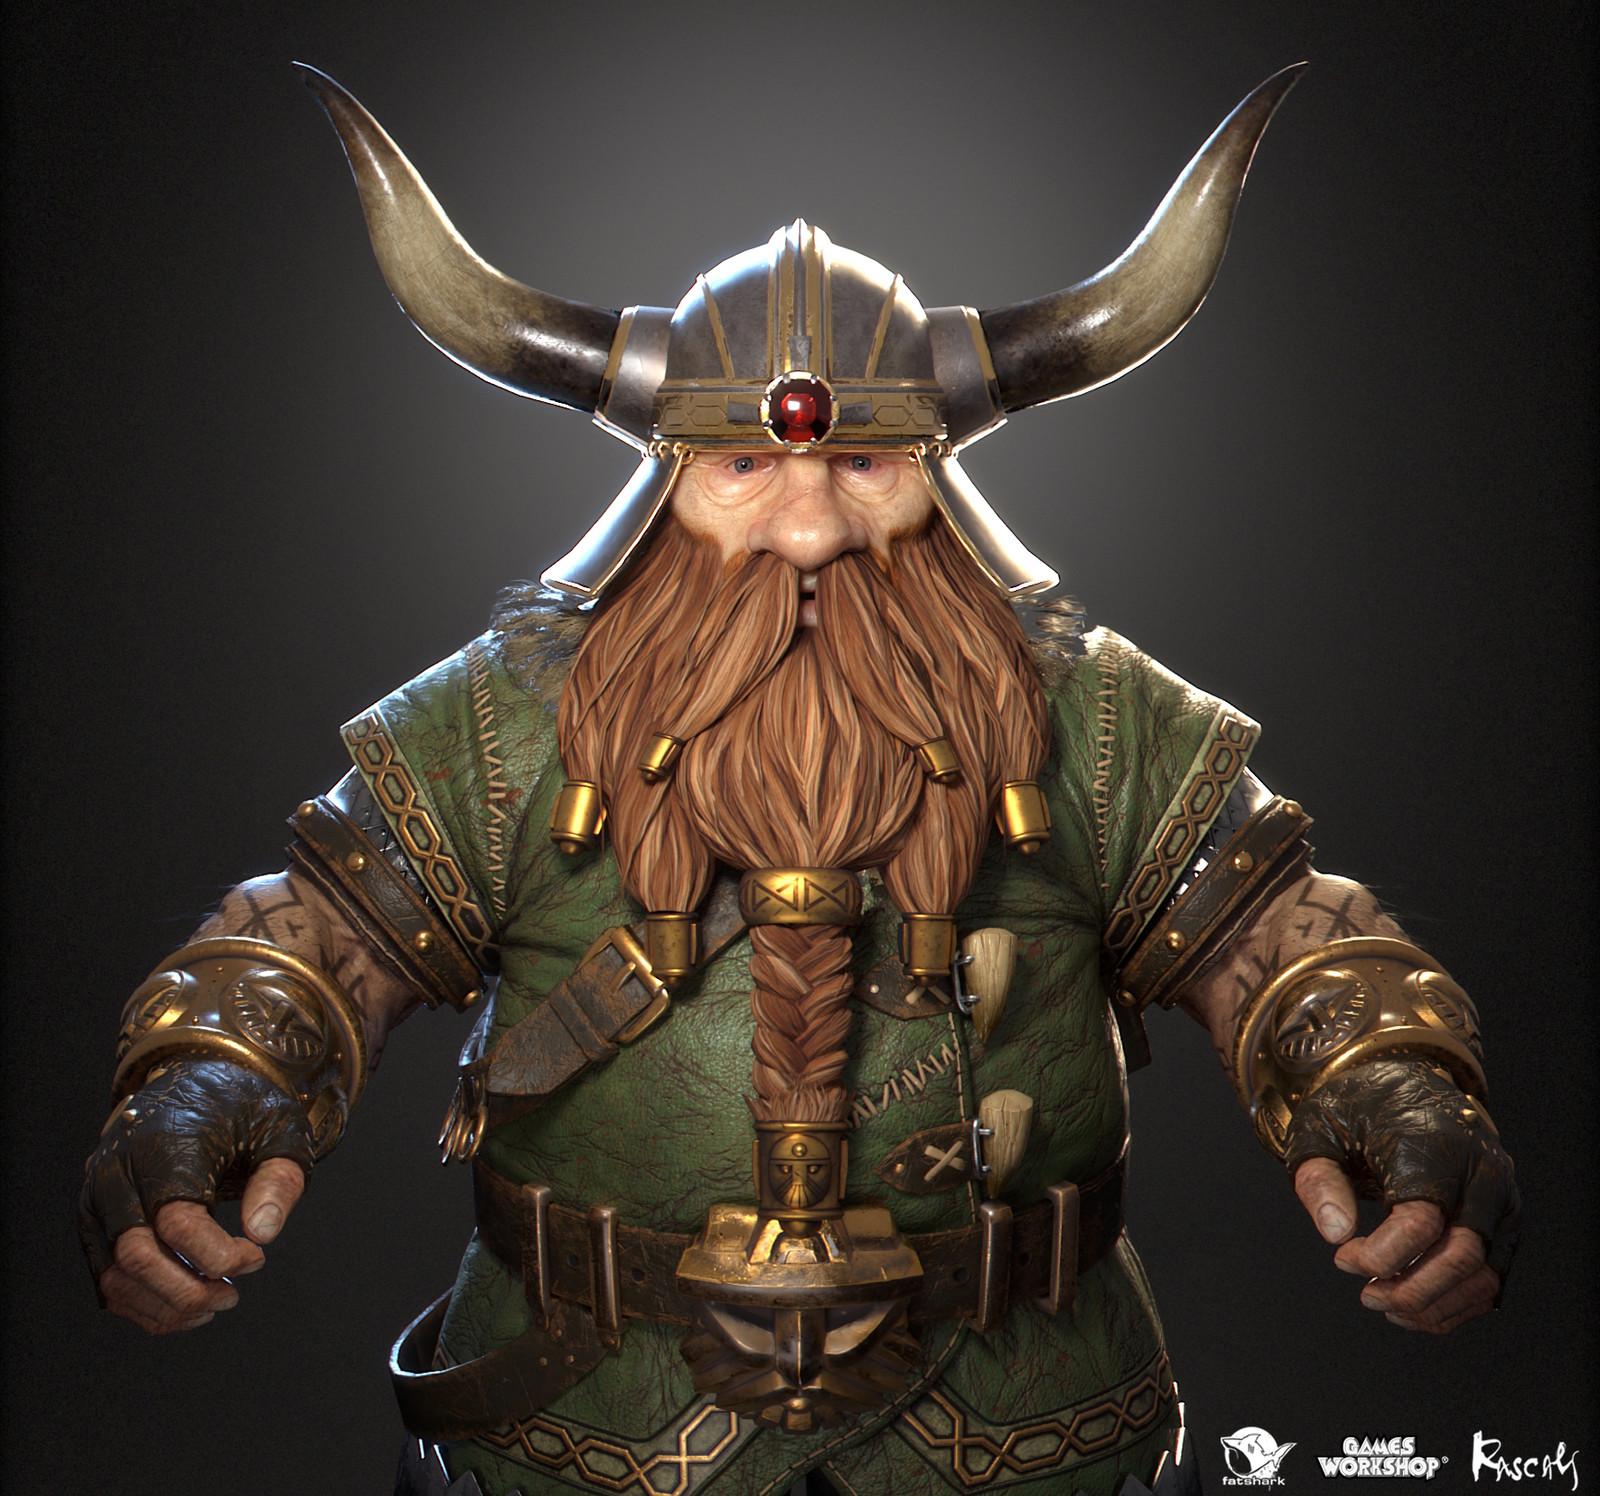 Bardin Goreksson: Ranger Veteran is one of the playable hero variants Rascals made for Warhammer: Vermintide II, Fatshark's award-winning co-op meelee action published by Games Workshop.